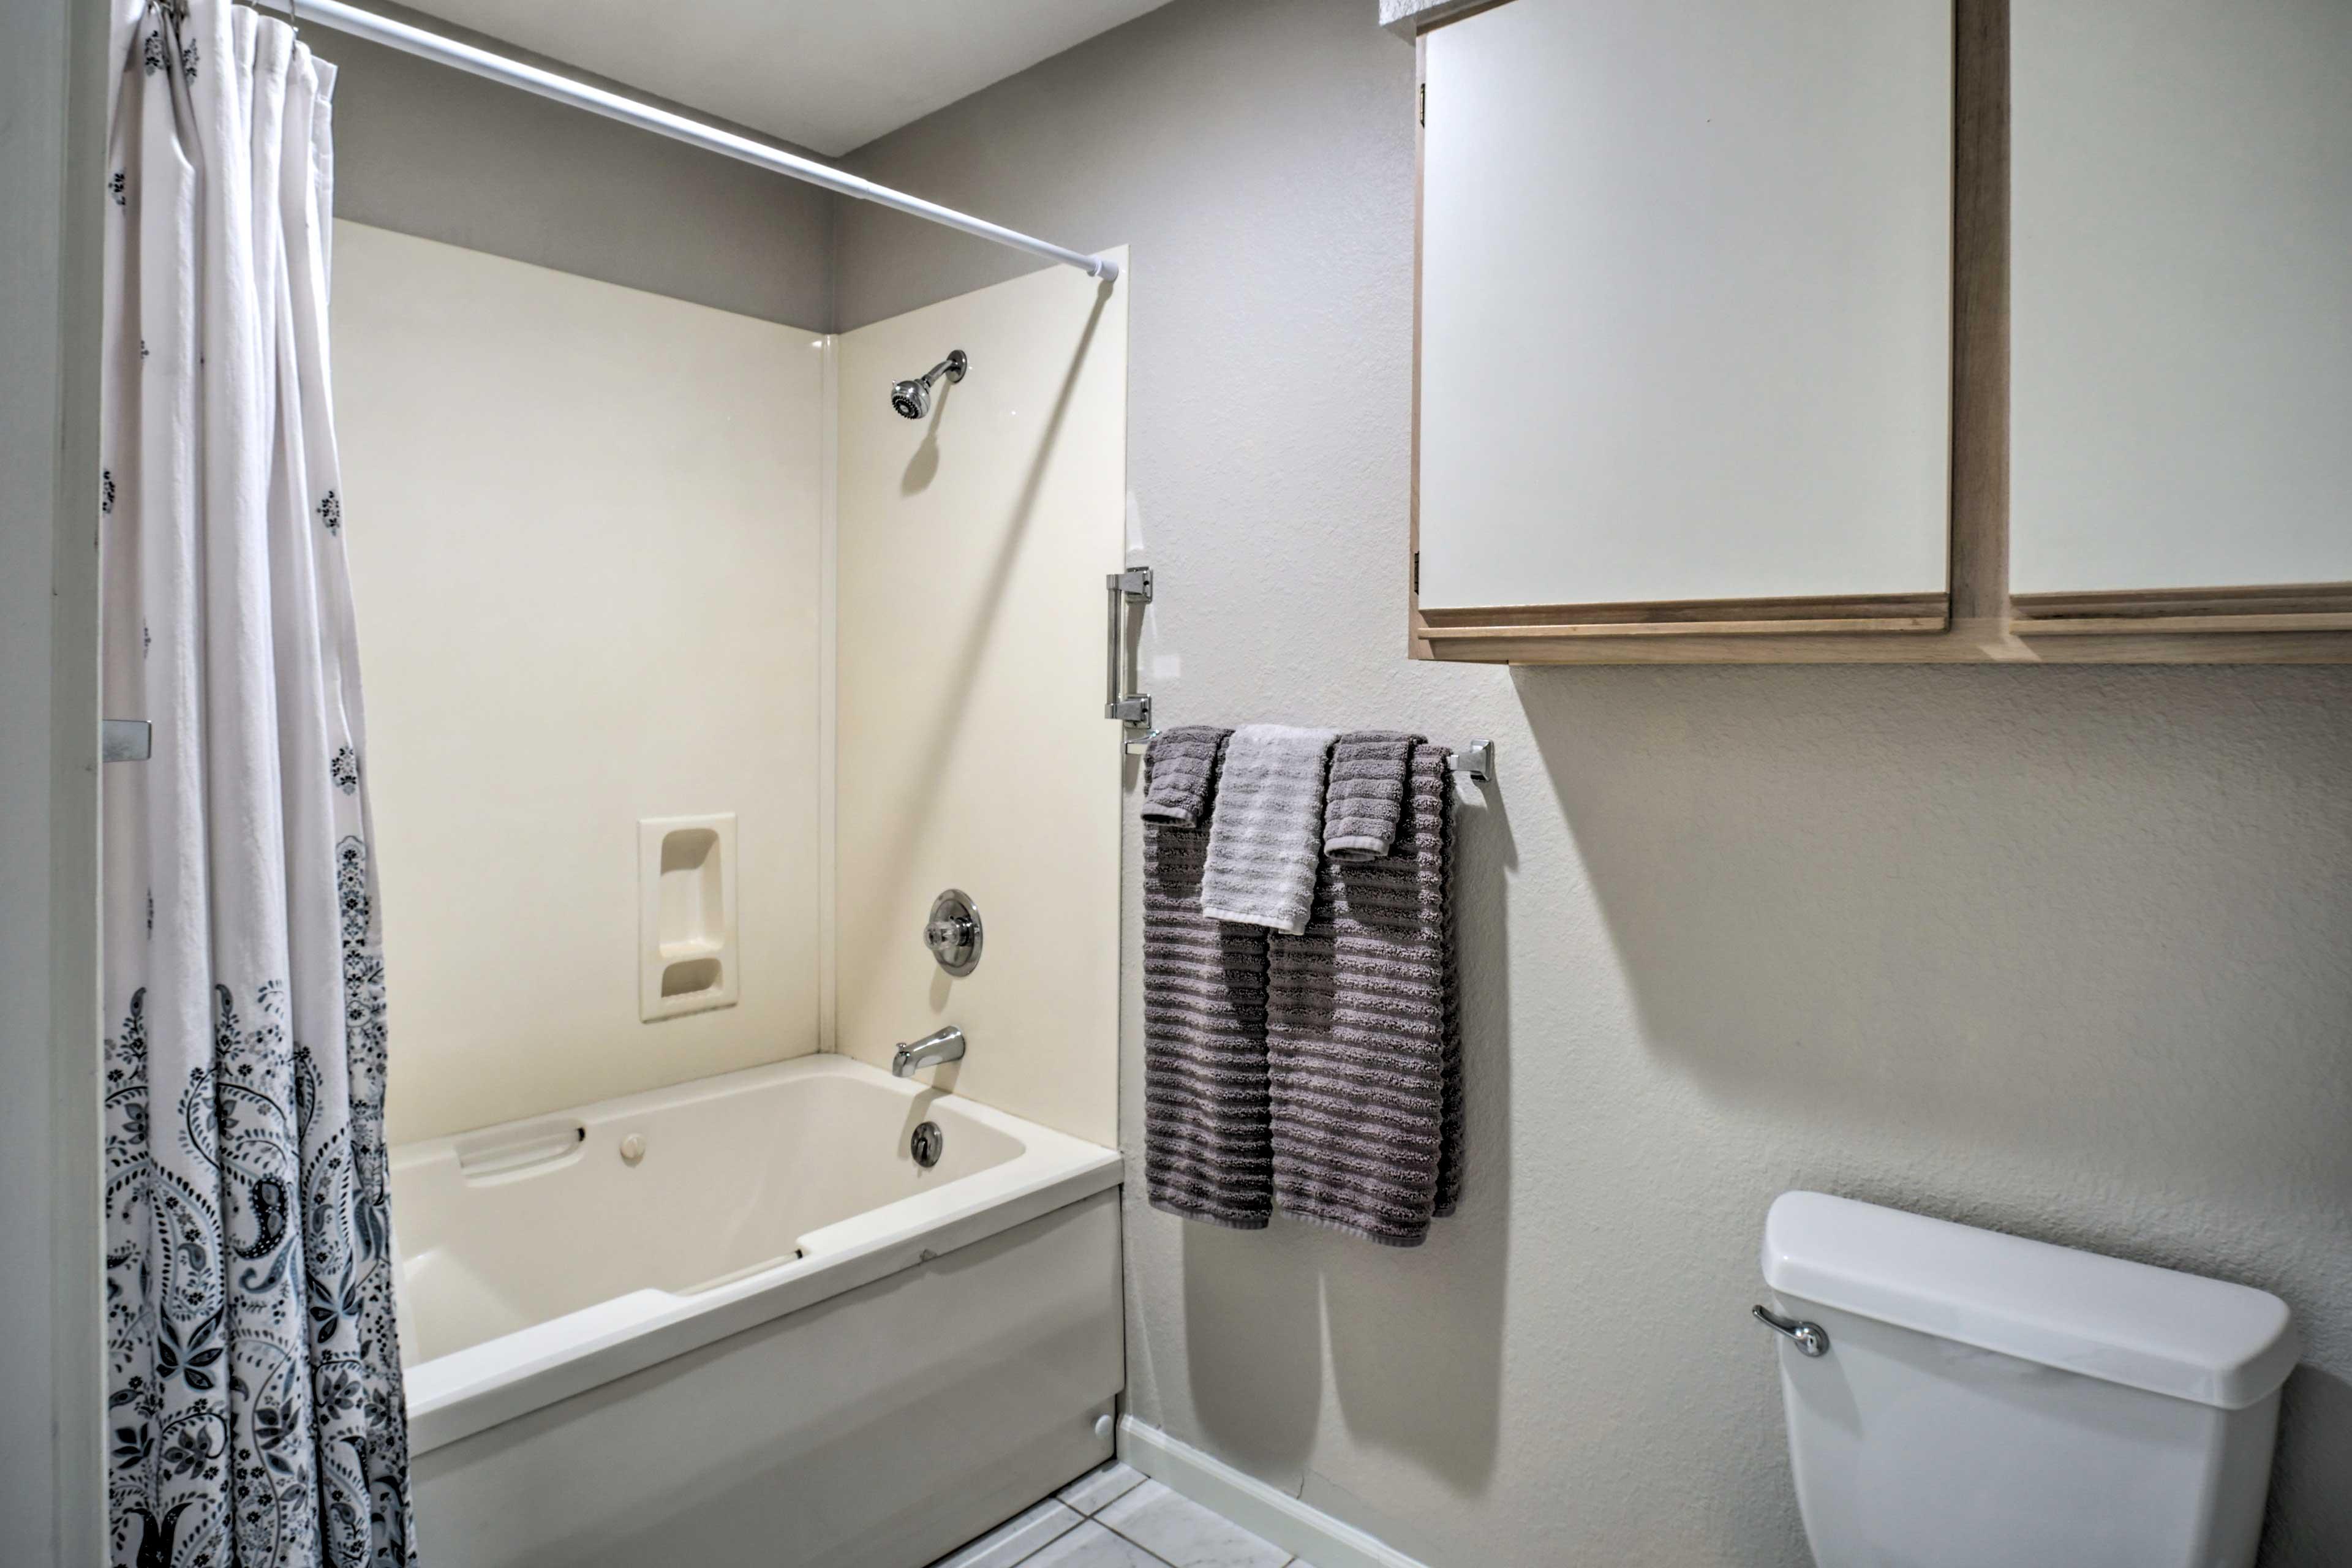 The en-suite offers a shower/tub combo.